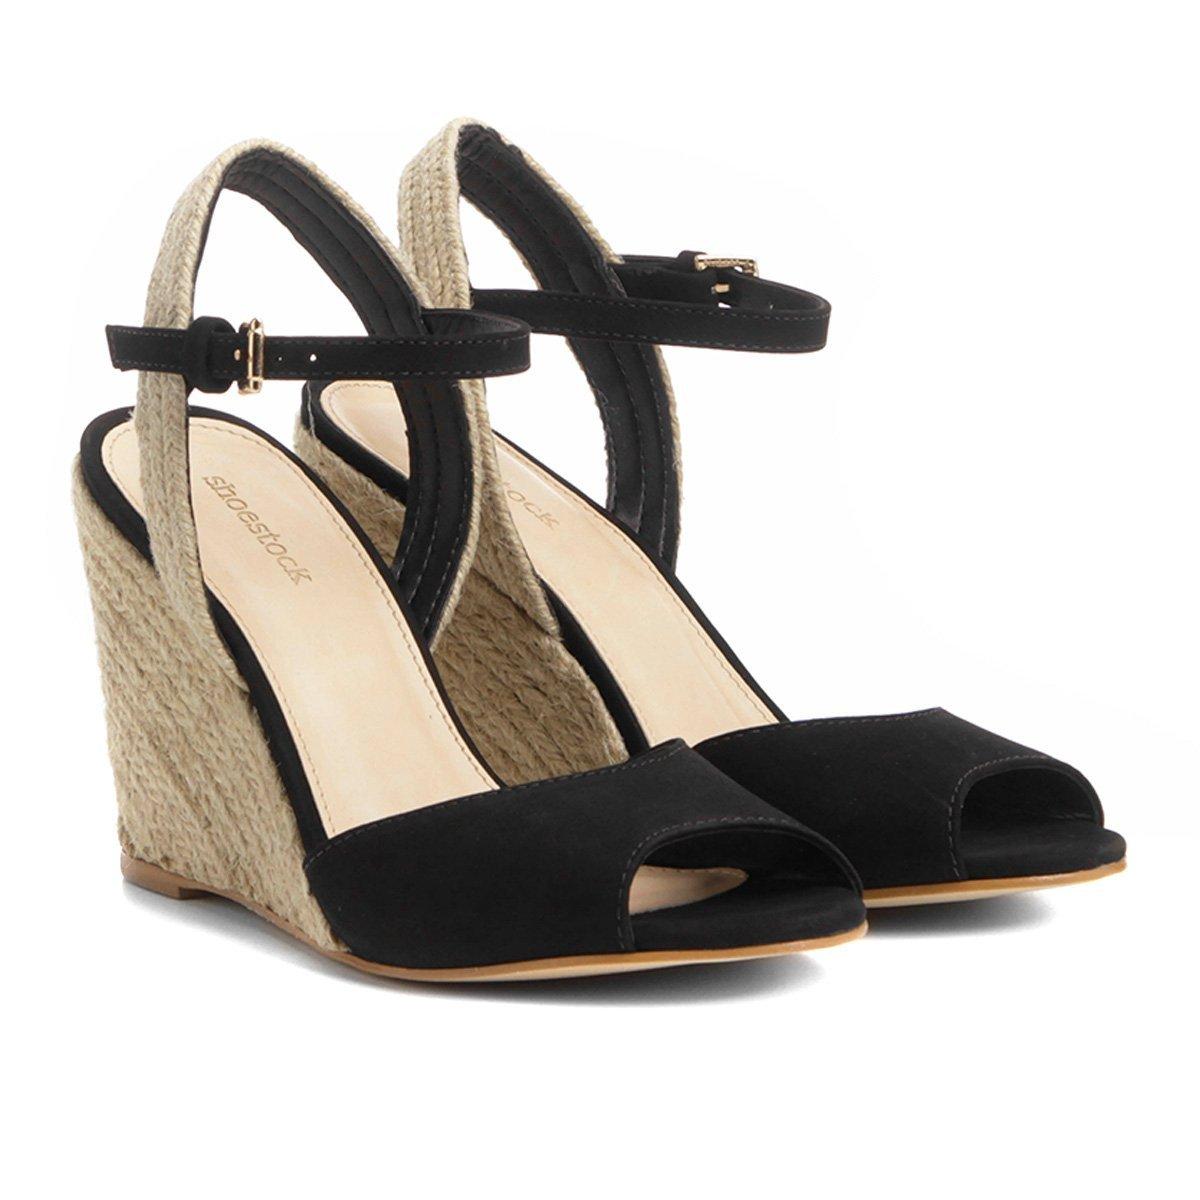 cd71f424a Sandália Anabela Couro Shoestock Corda Feminina - Preto - Compre Agora